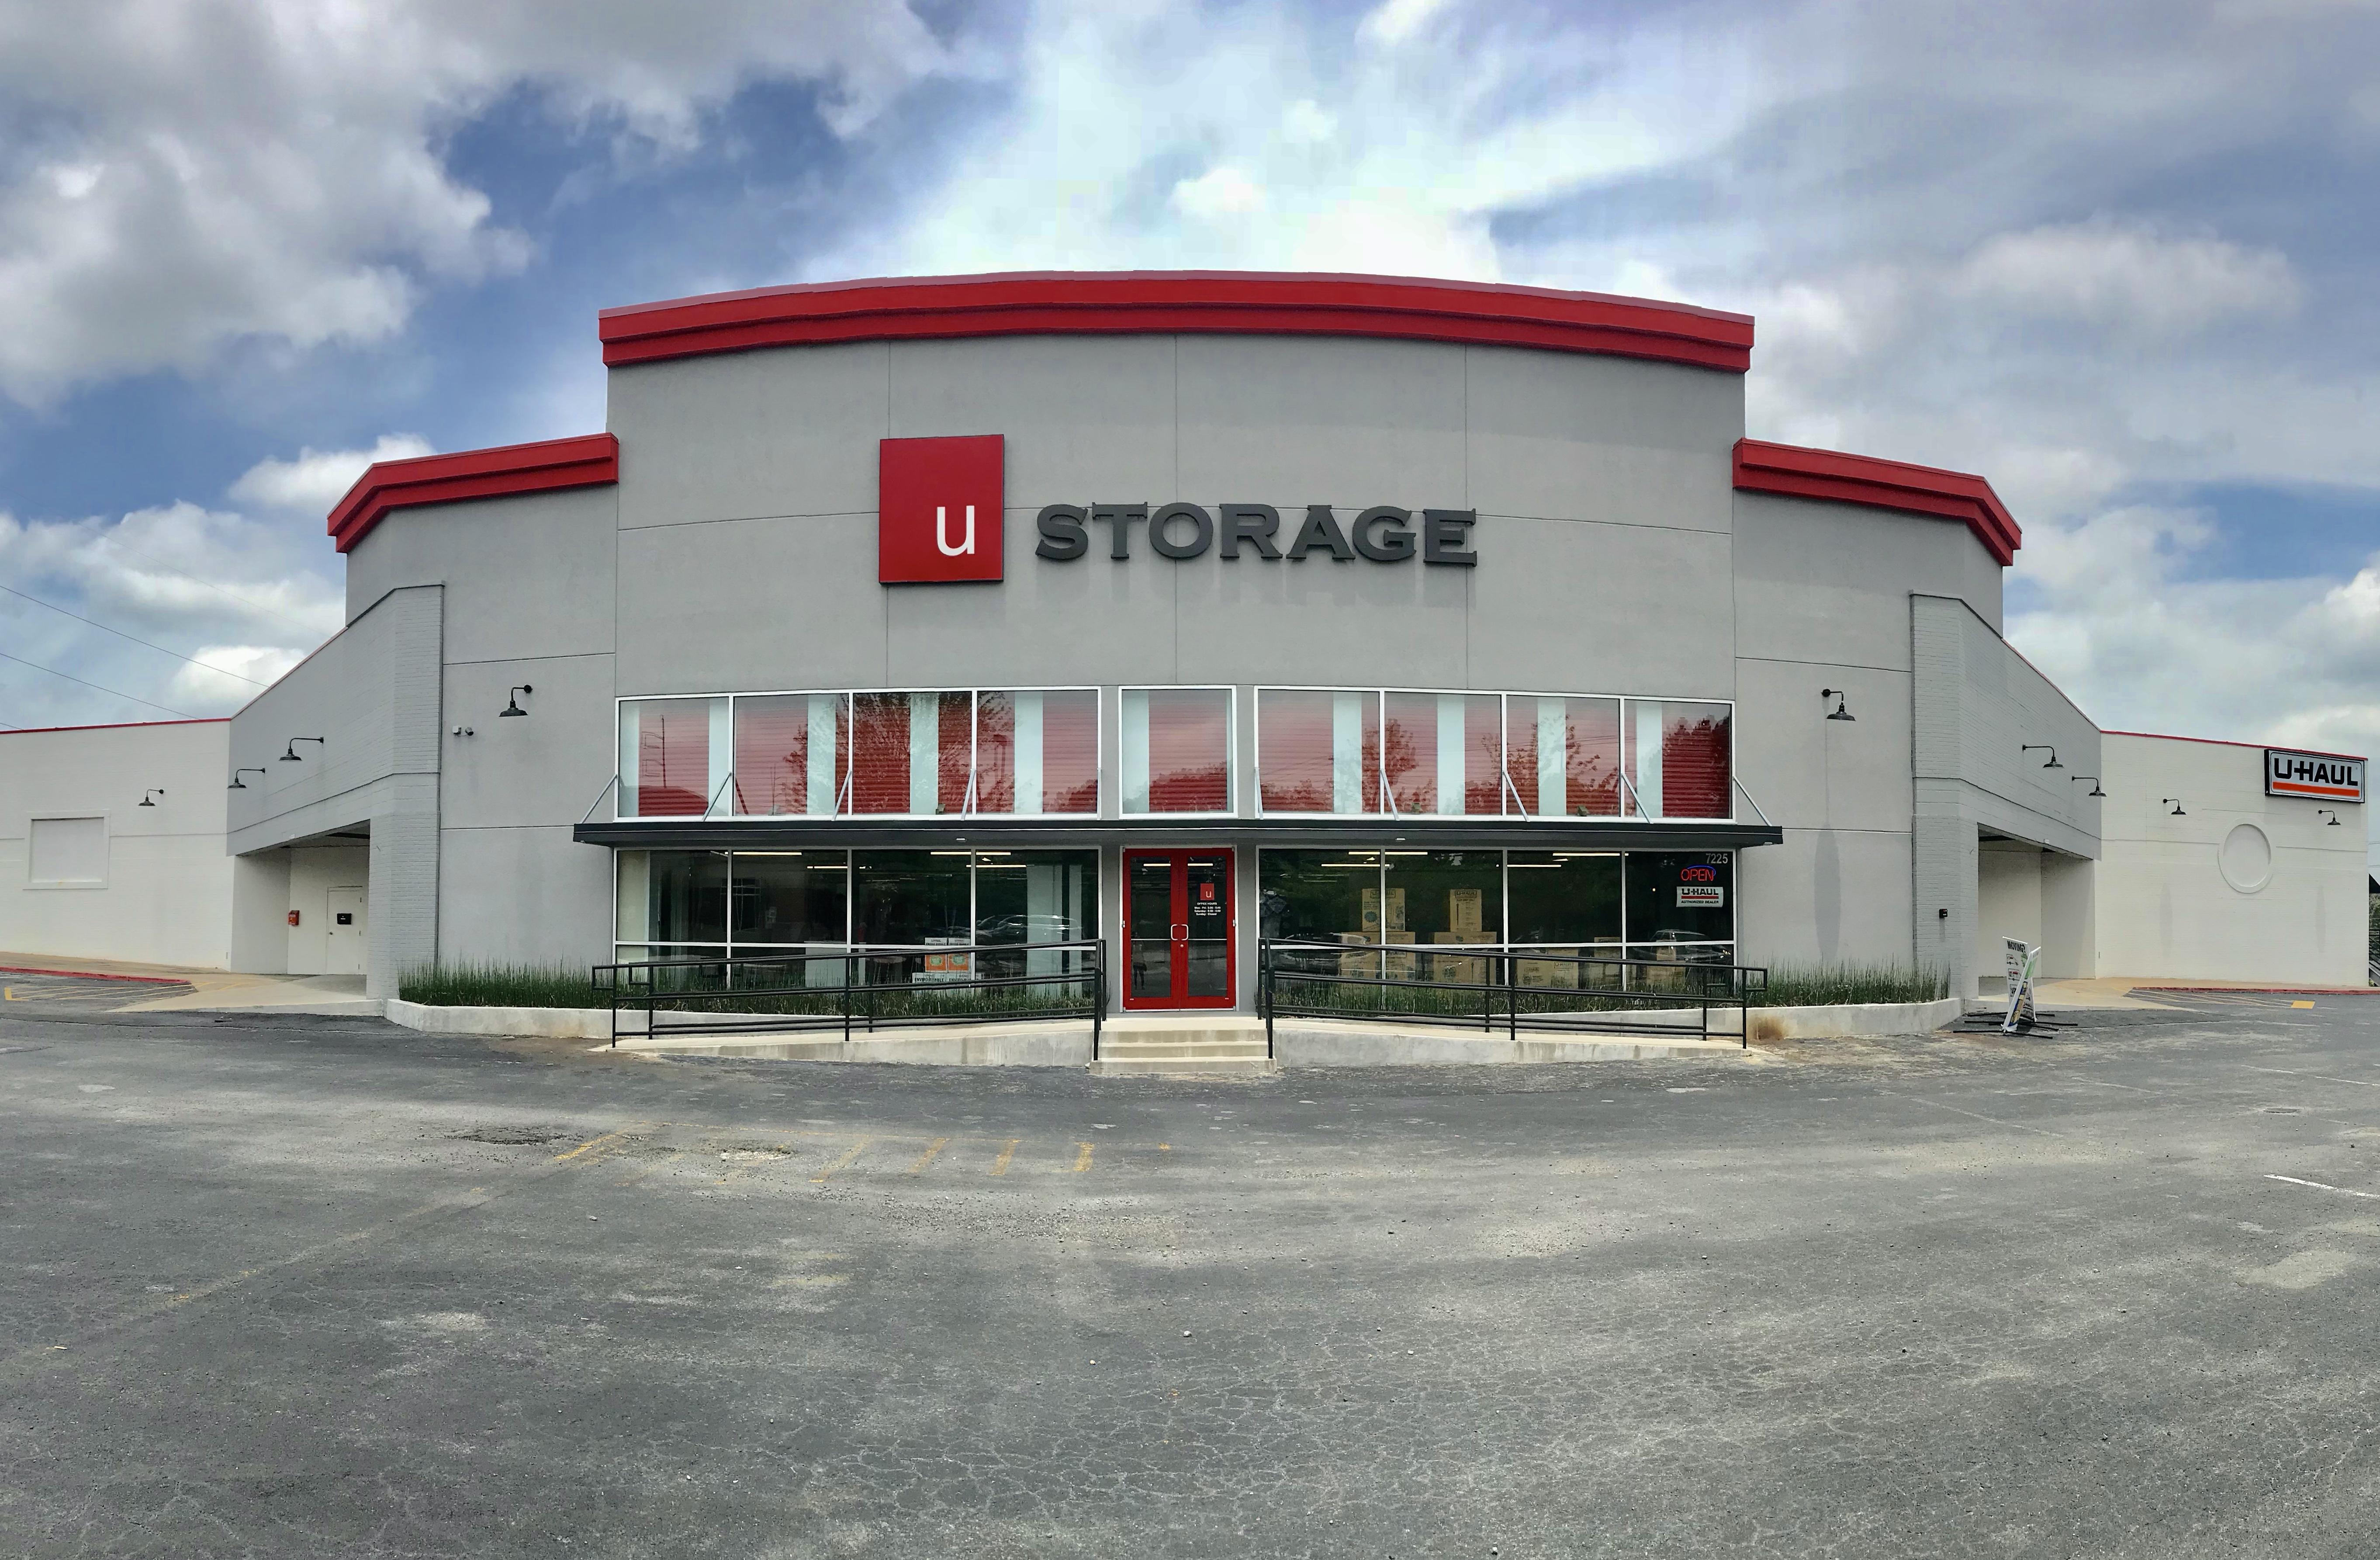 U Storage